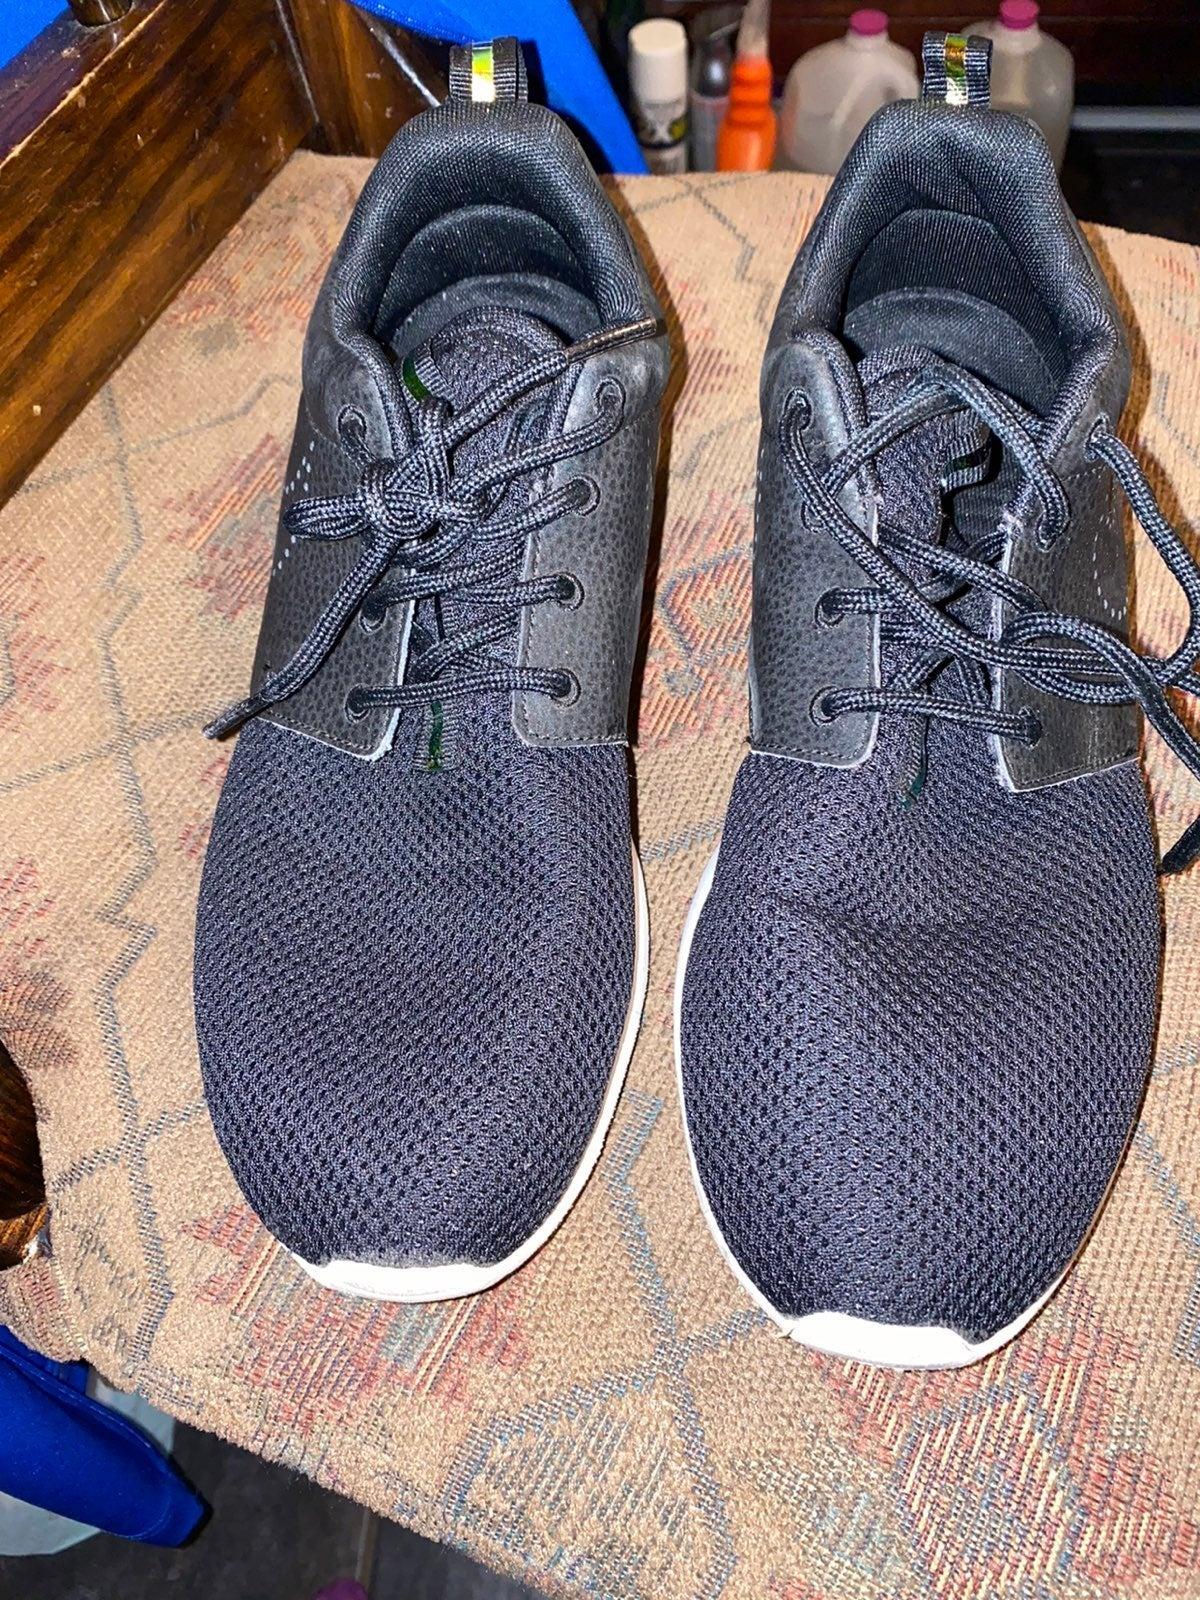 Nike womens size 9.5